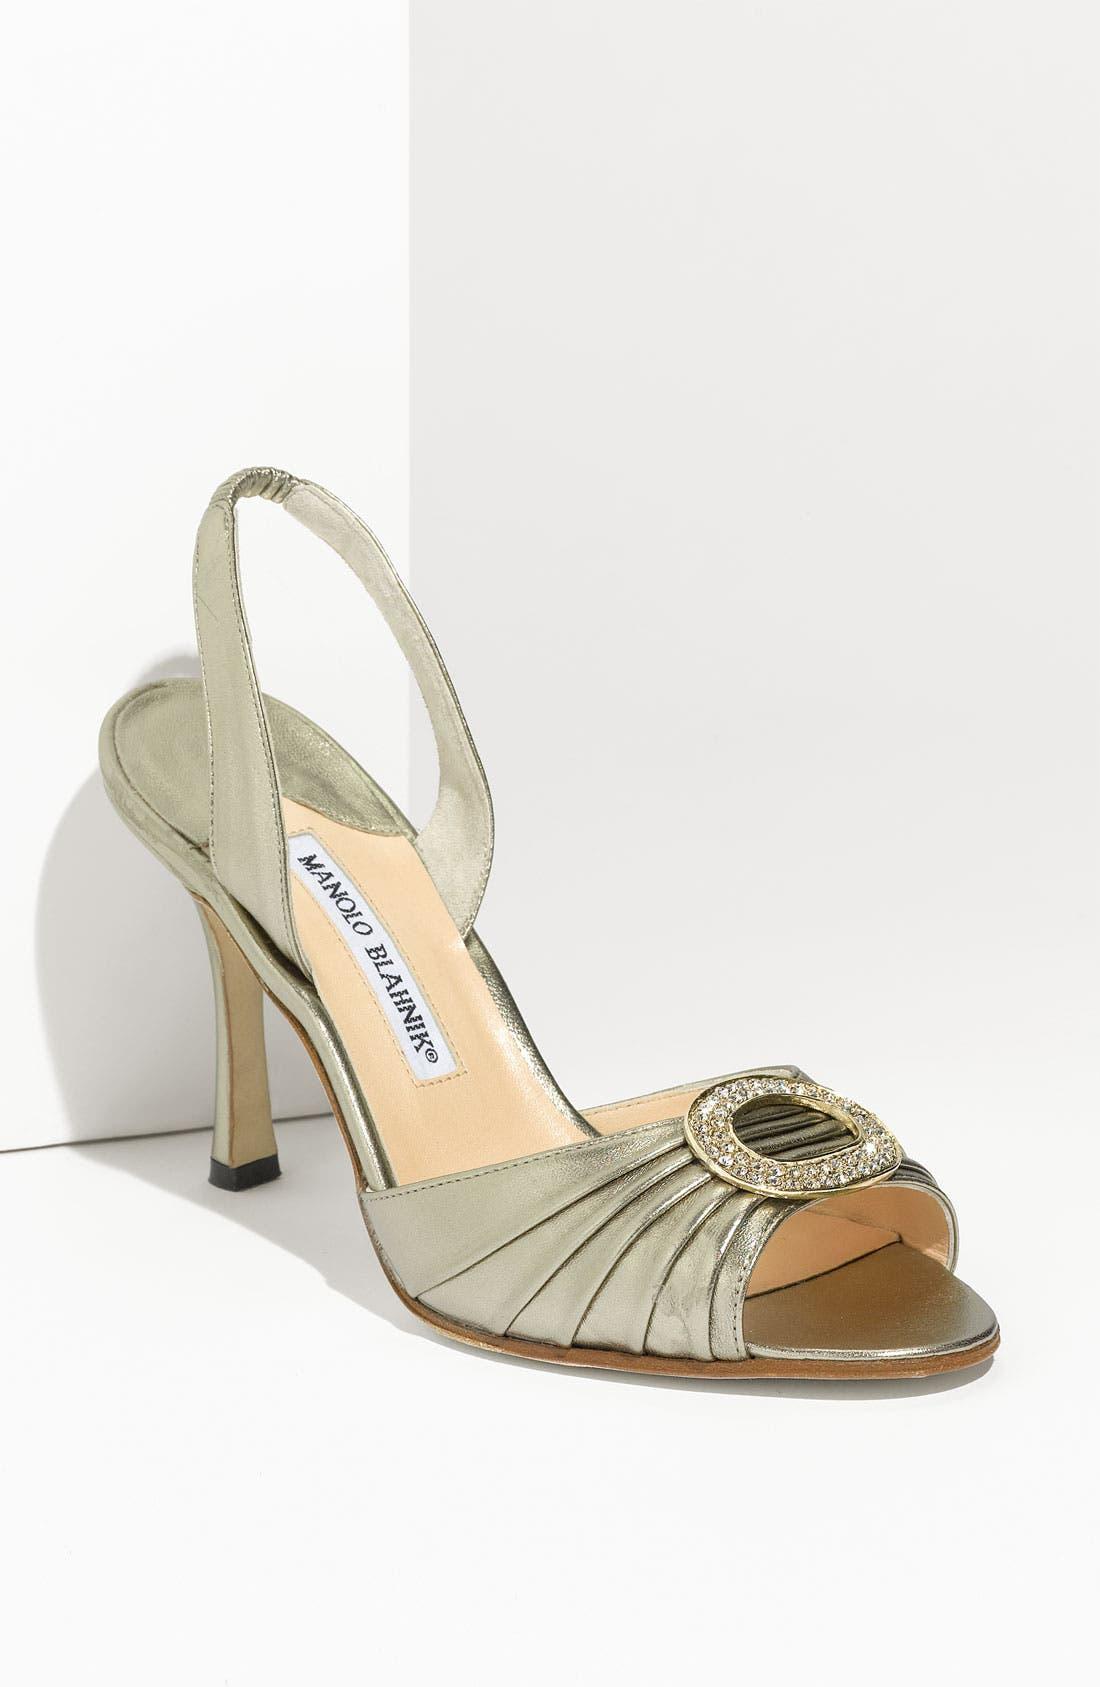 Manolo Blahnik Sedaraby Embellished Sandals discount authentic online 100% guaranteed sale online real sale online free shipping buy sneakernews sale online w1NBr7LBbI